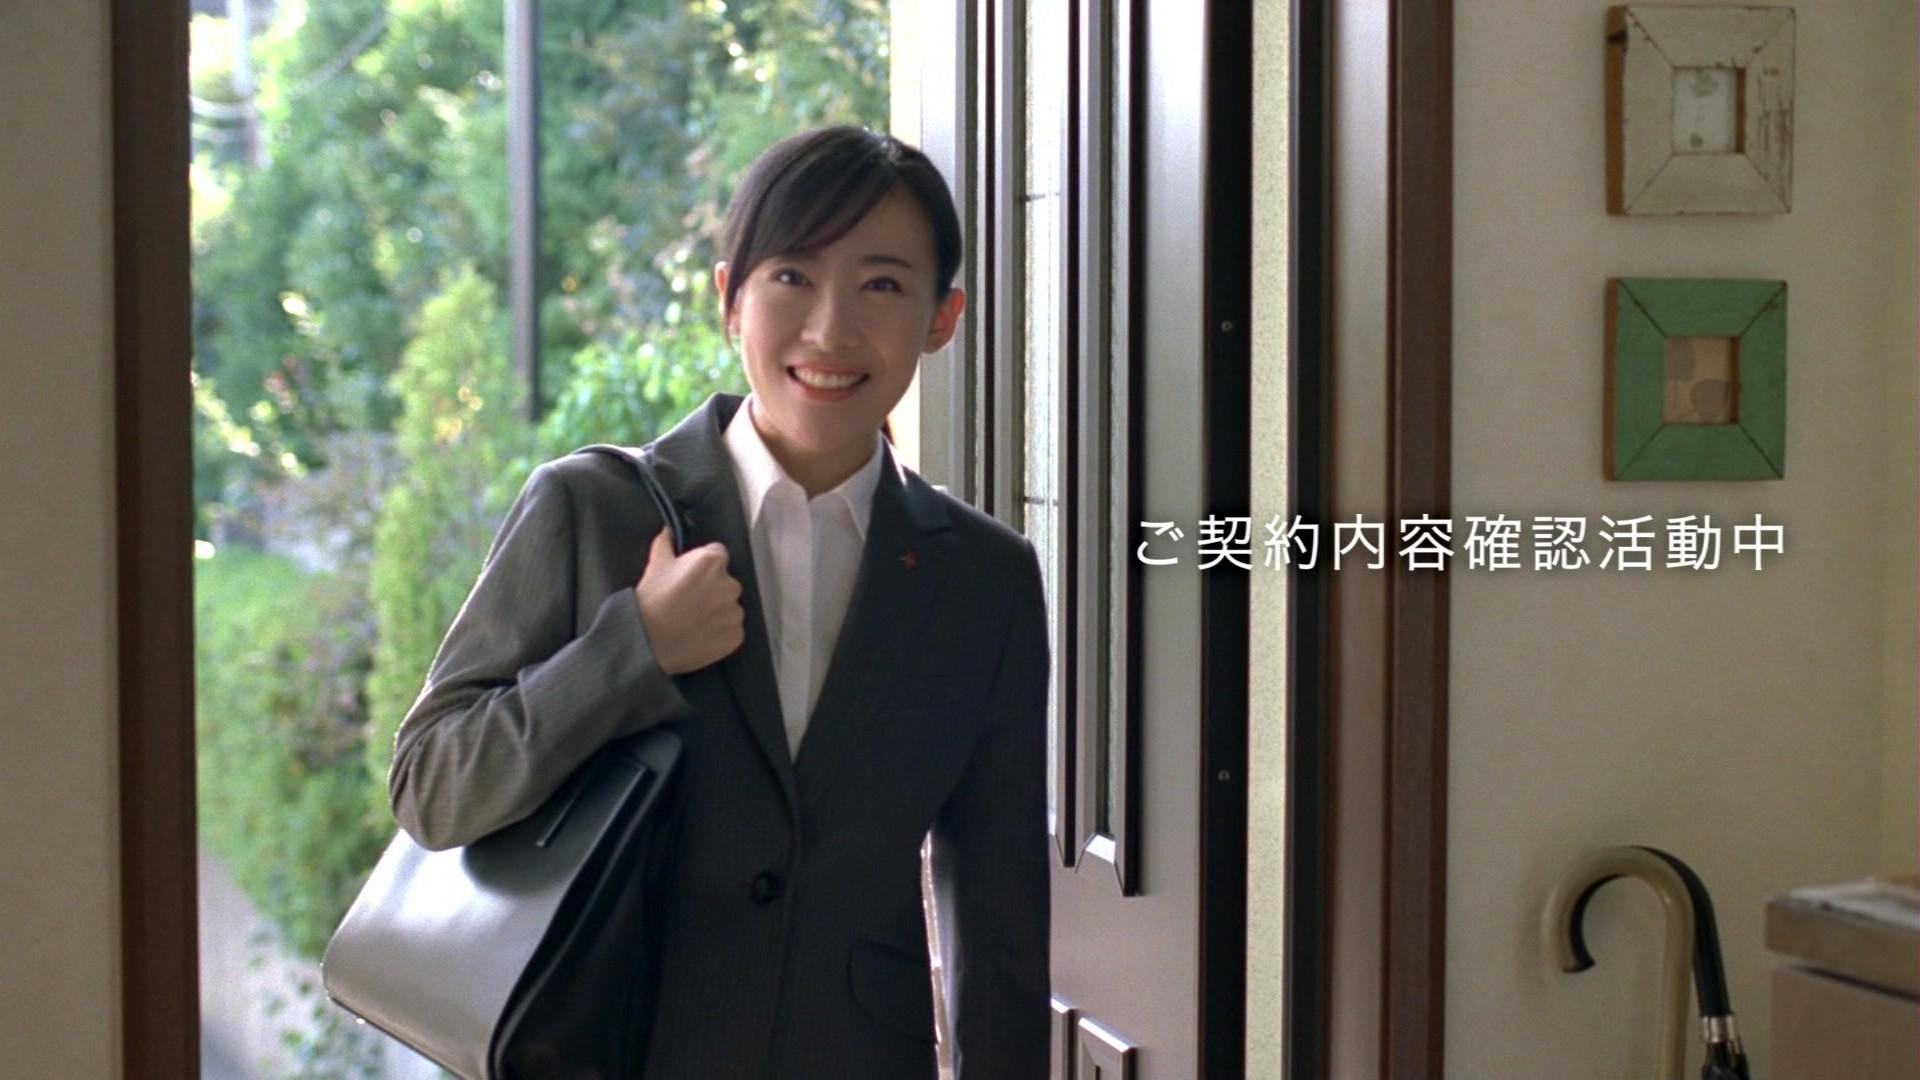 http://livedoor.blogimg.jp/konnnatv/imgs/9/c/9cbb0998.jpg